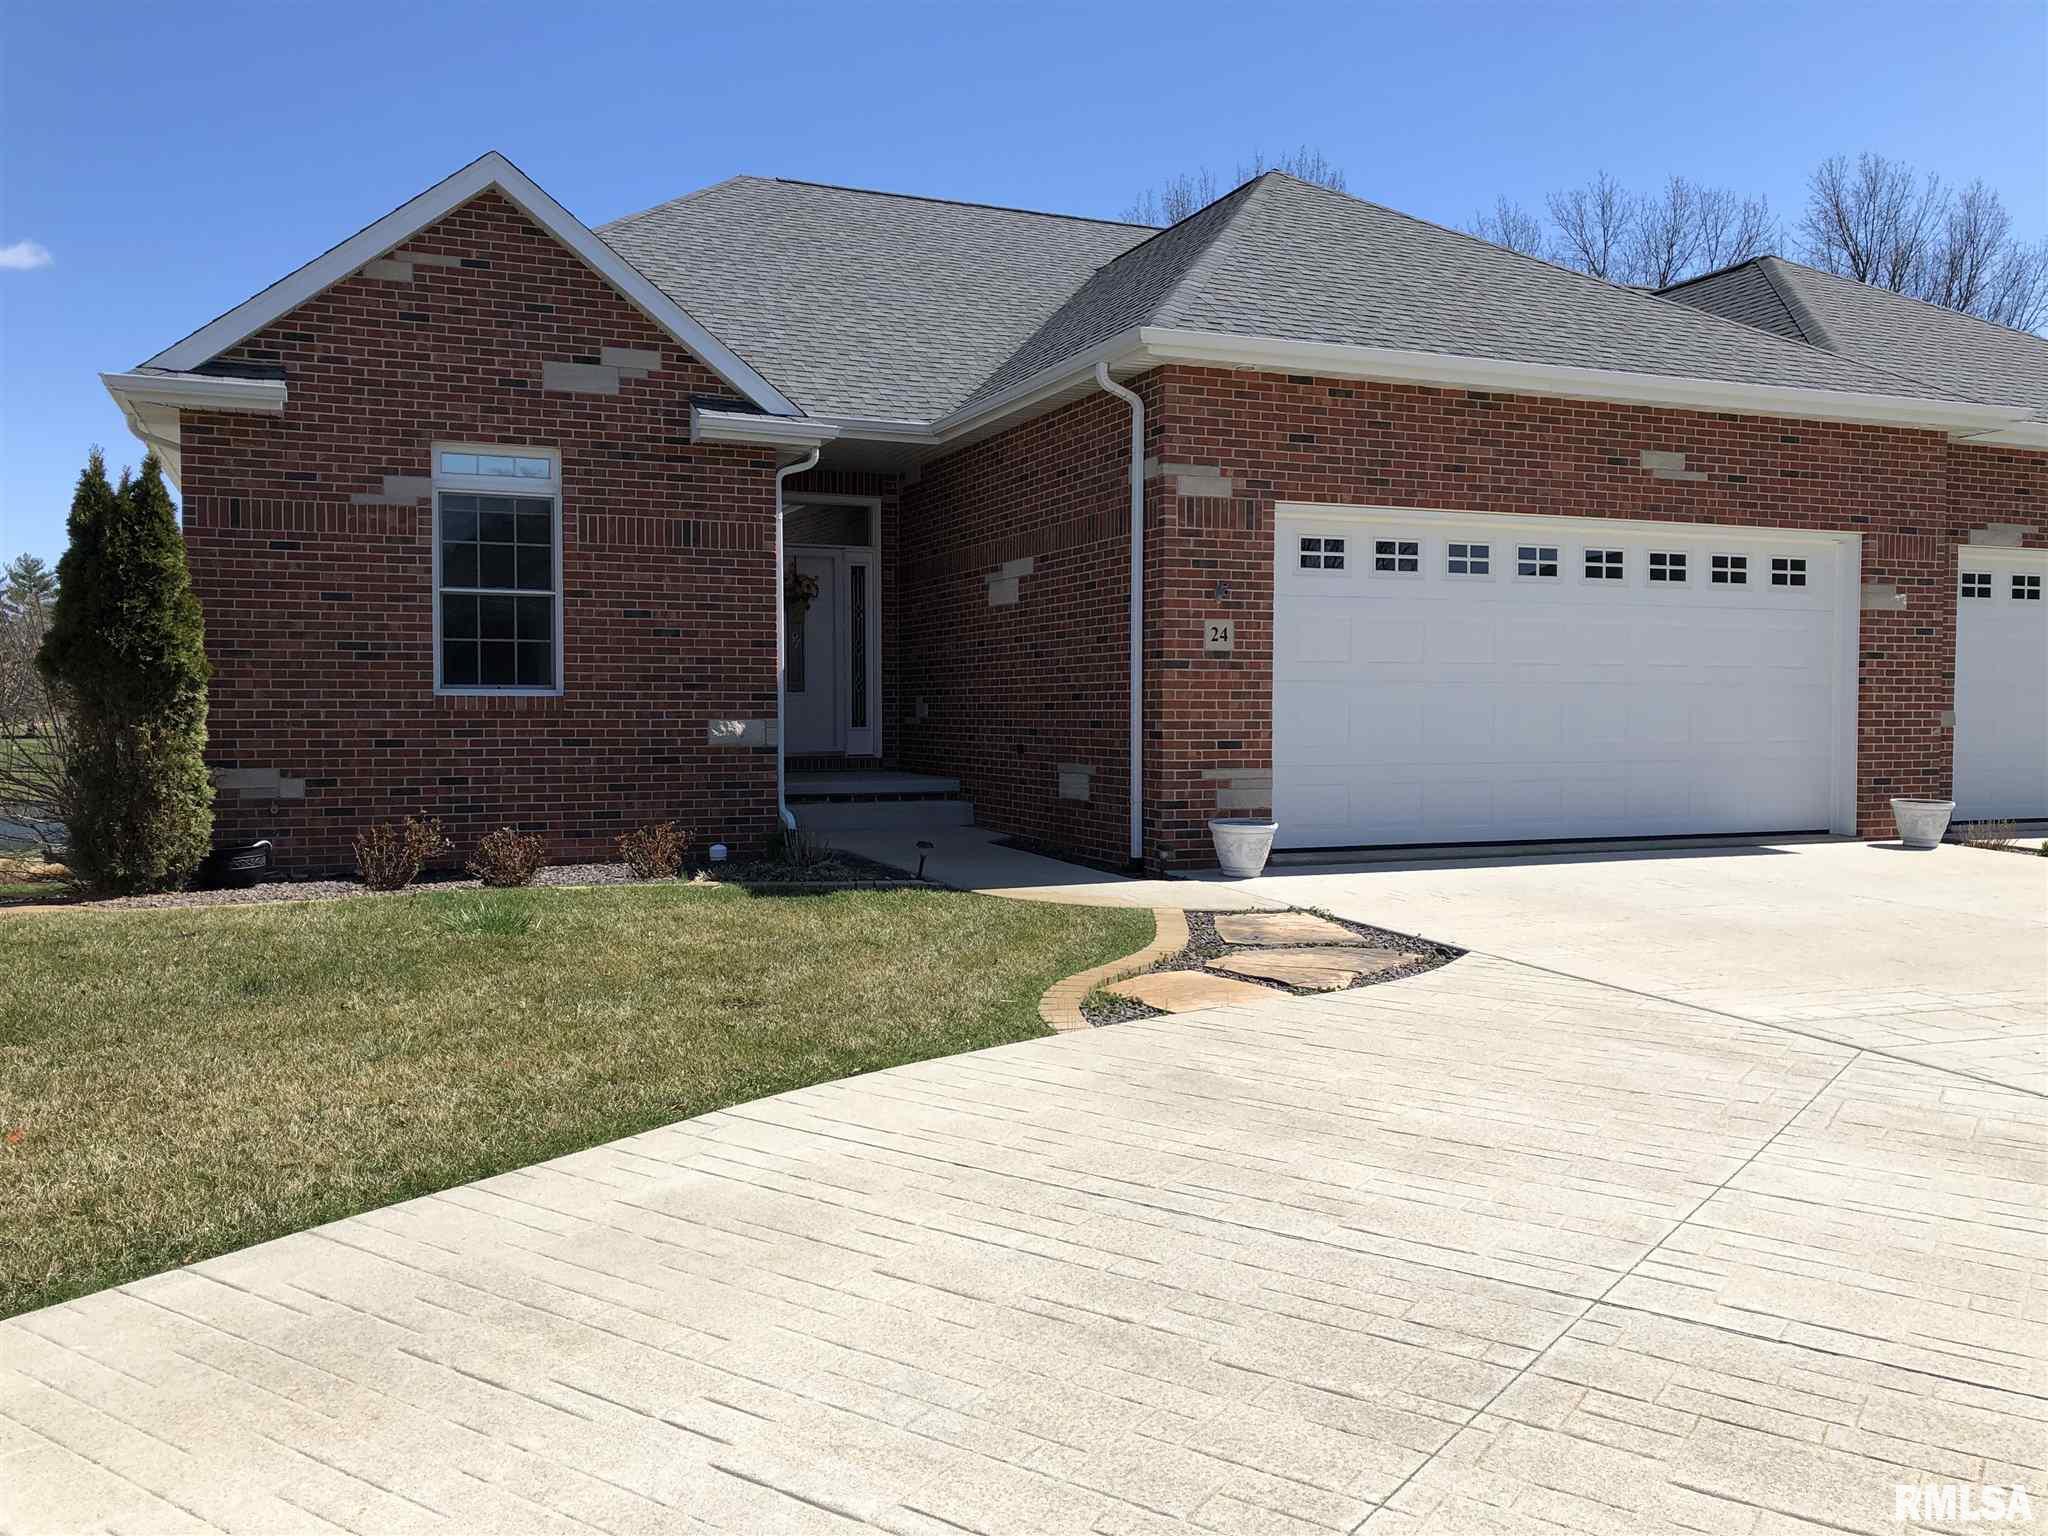 24 Mashie Property Photo - Springfield, IL real estate listing